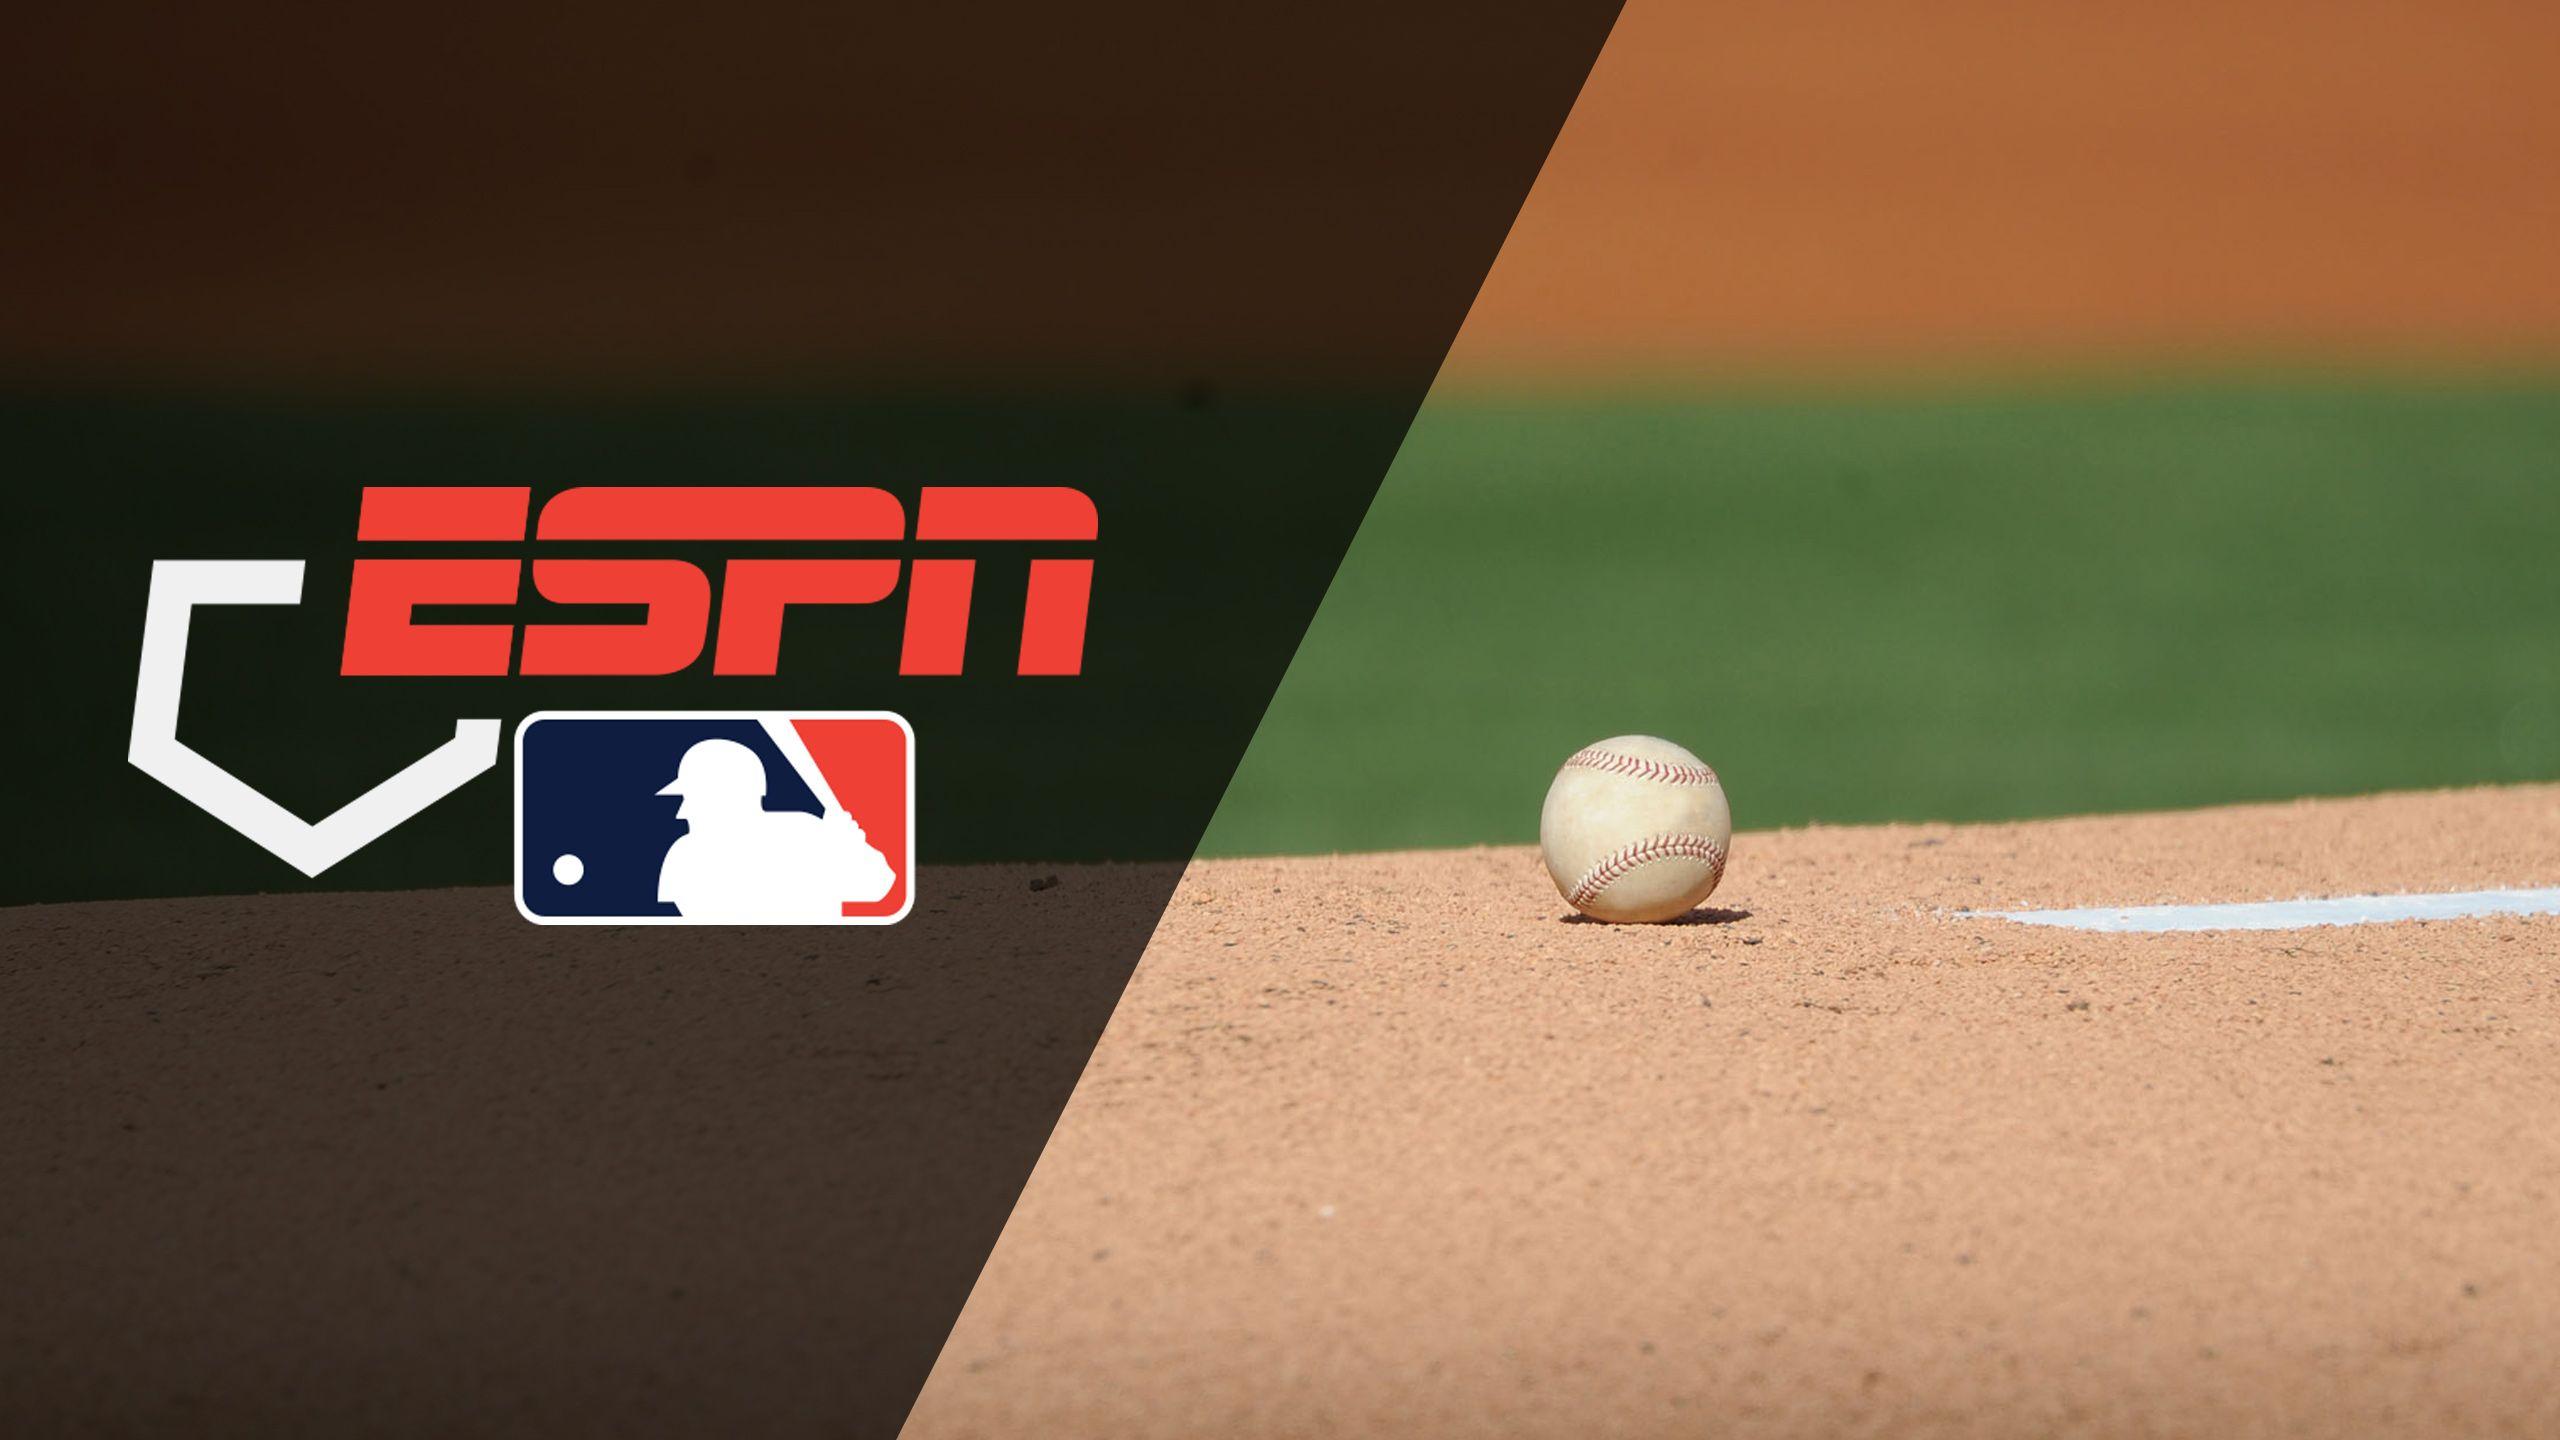 ESPN's Friday Night Baseball